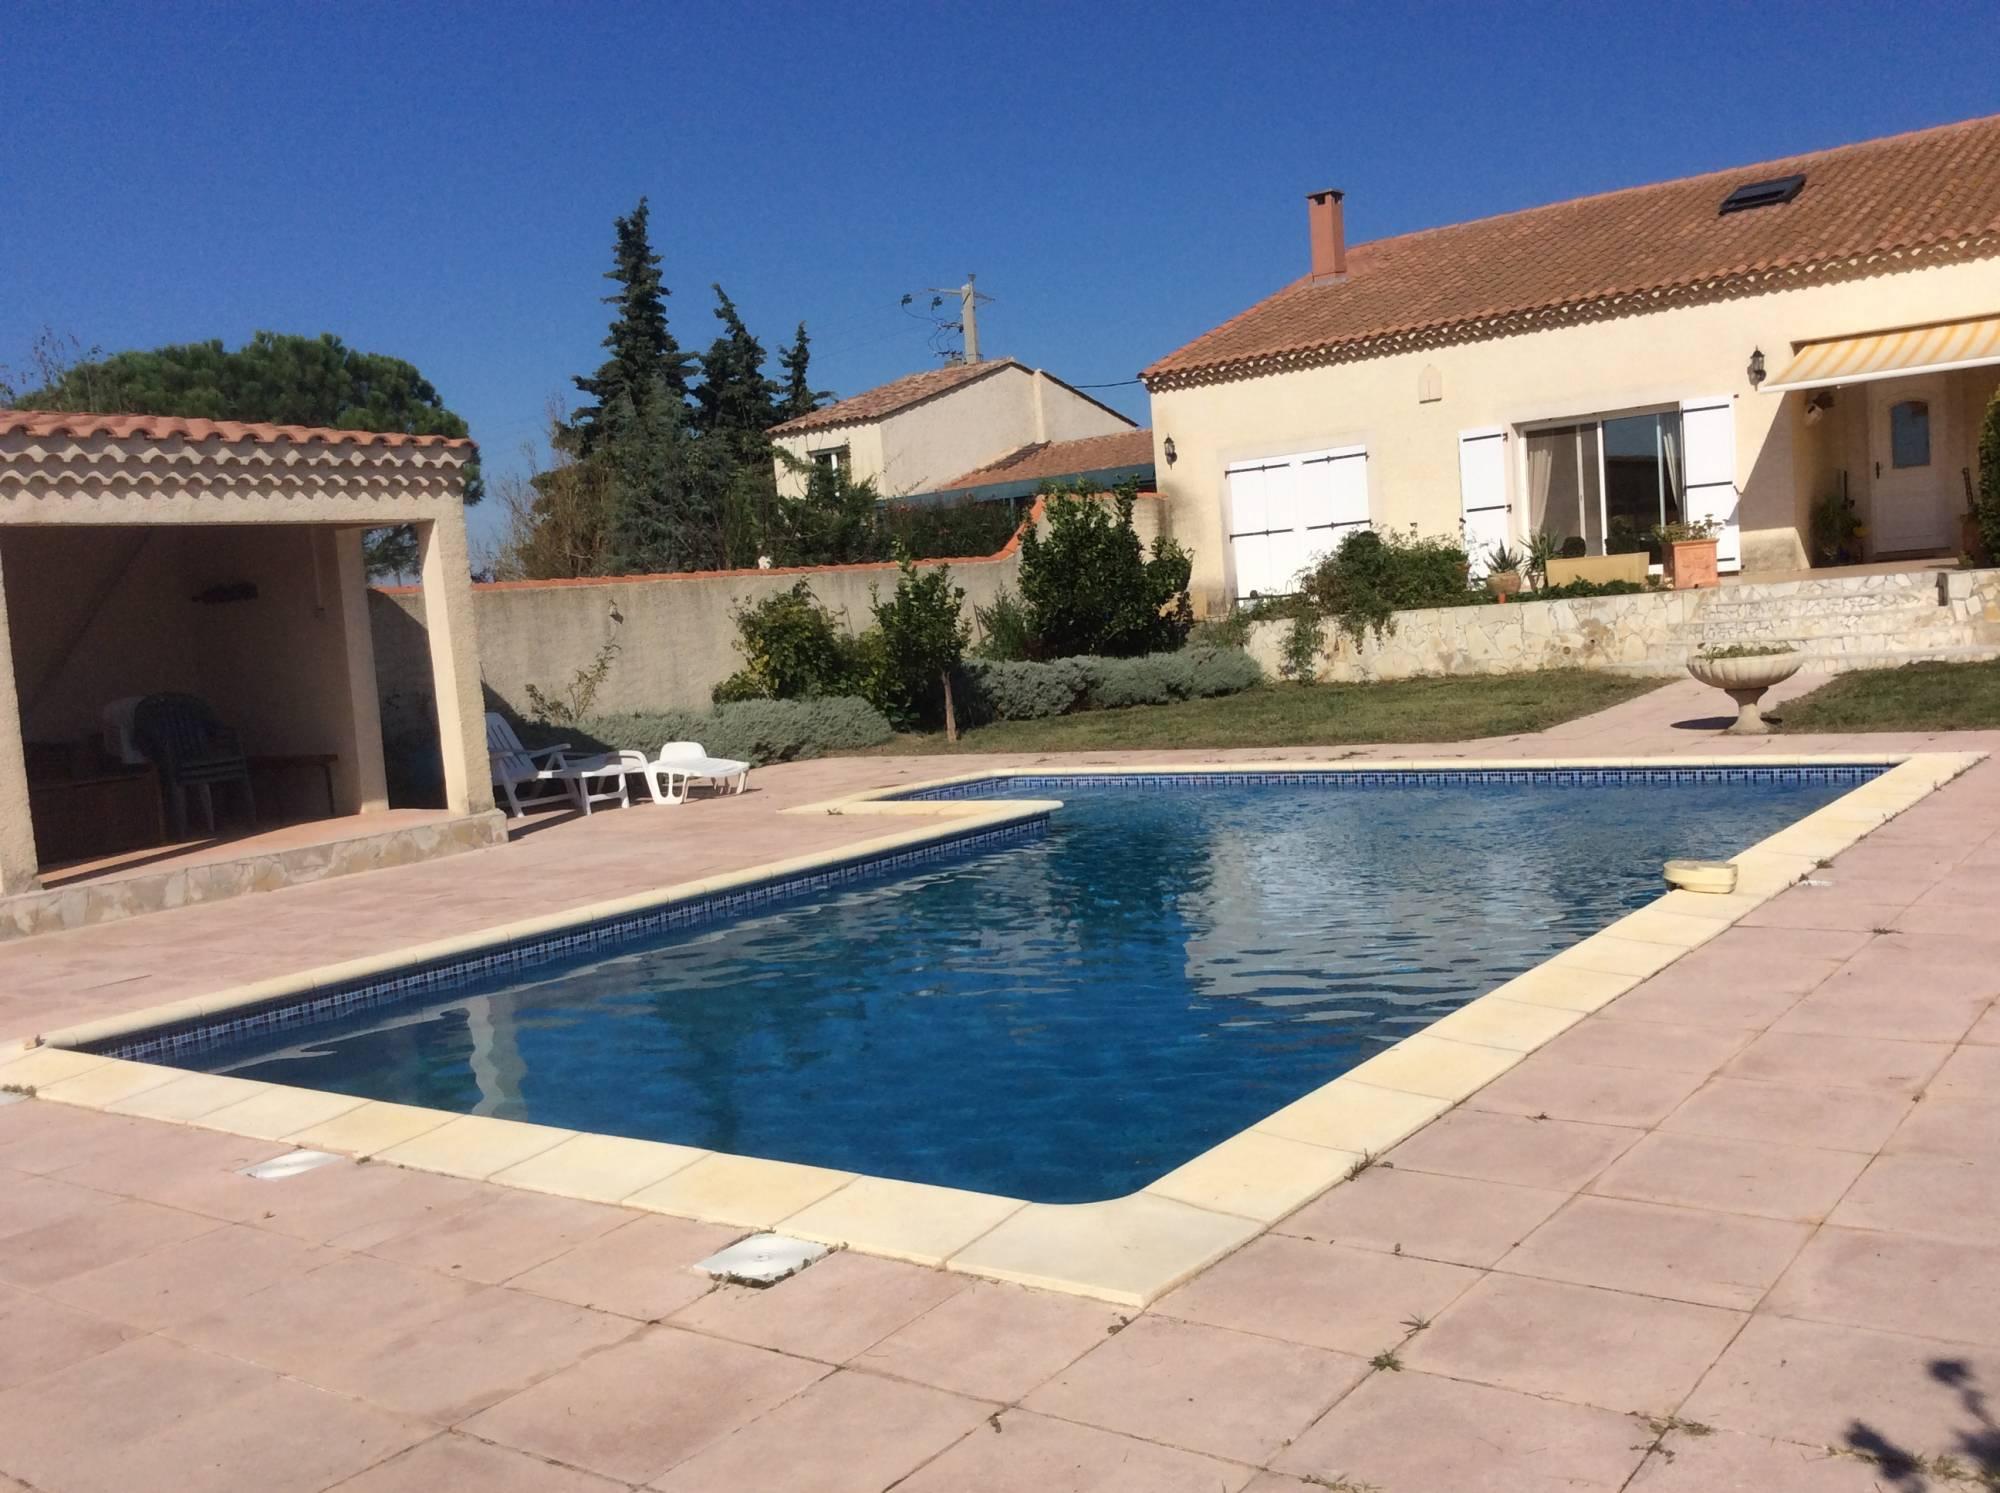 Villa en campagne type 6 13310 saint martin de crau villa - Agence immobiliere de la crau salon de provence ...